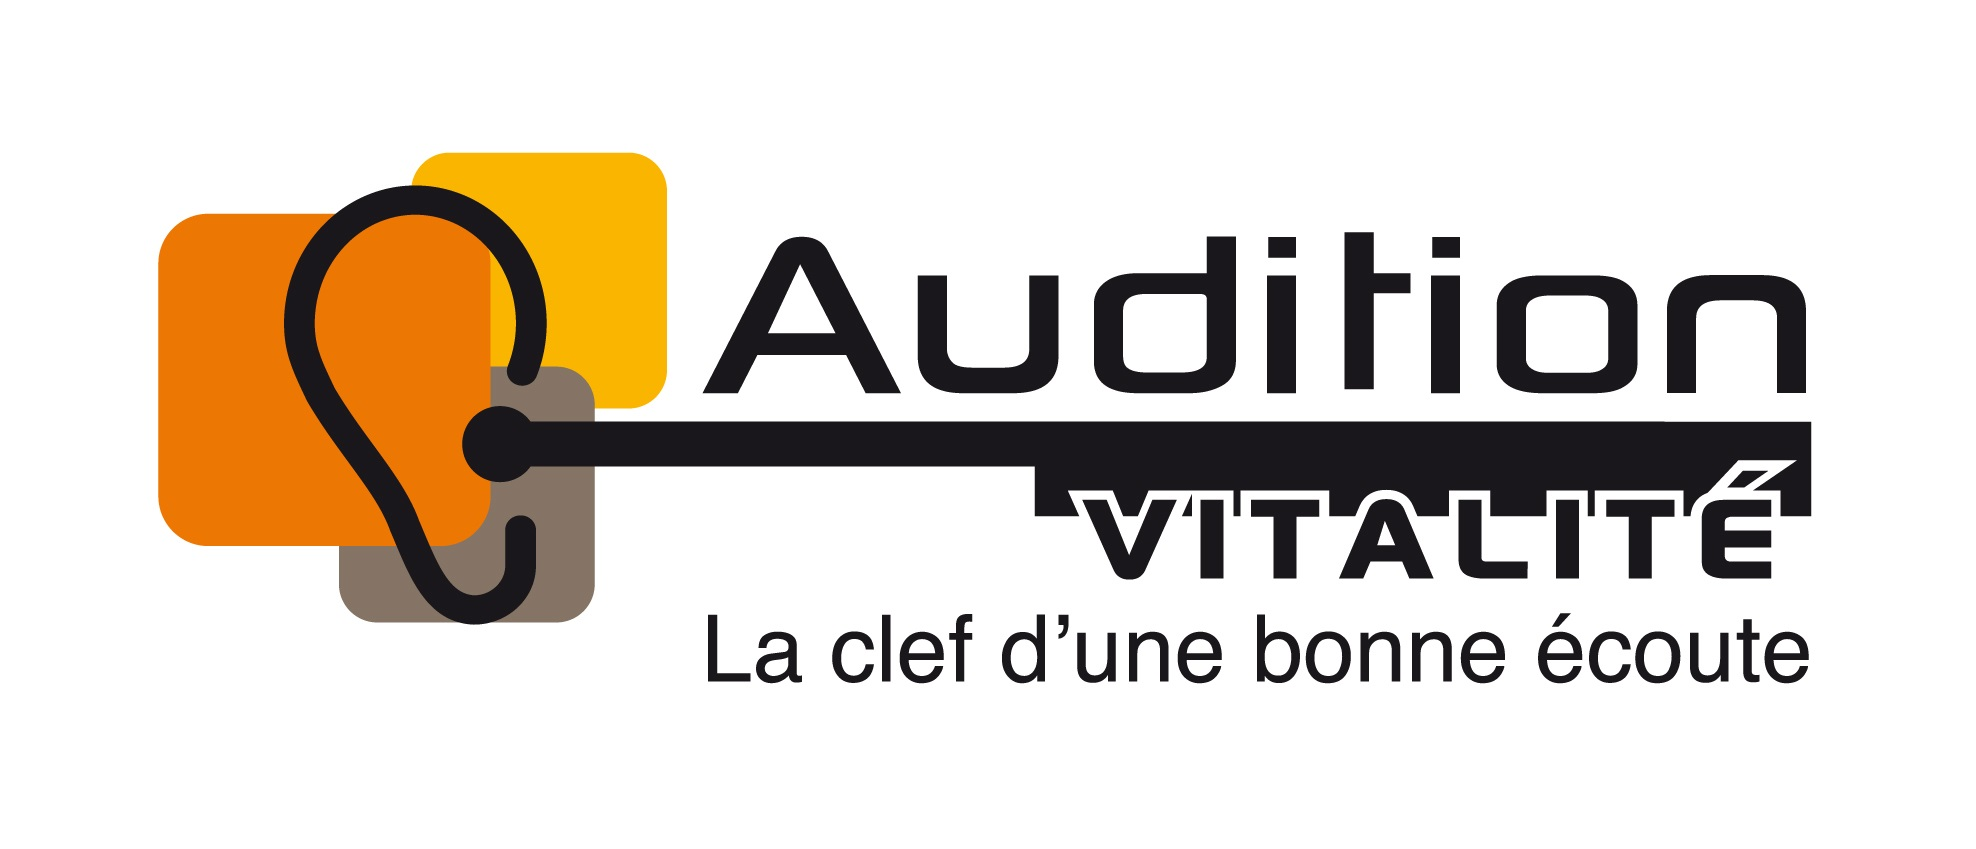 AUDITION VITALITE